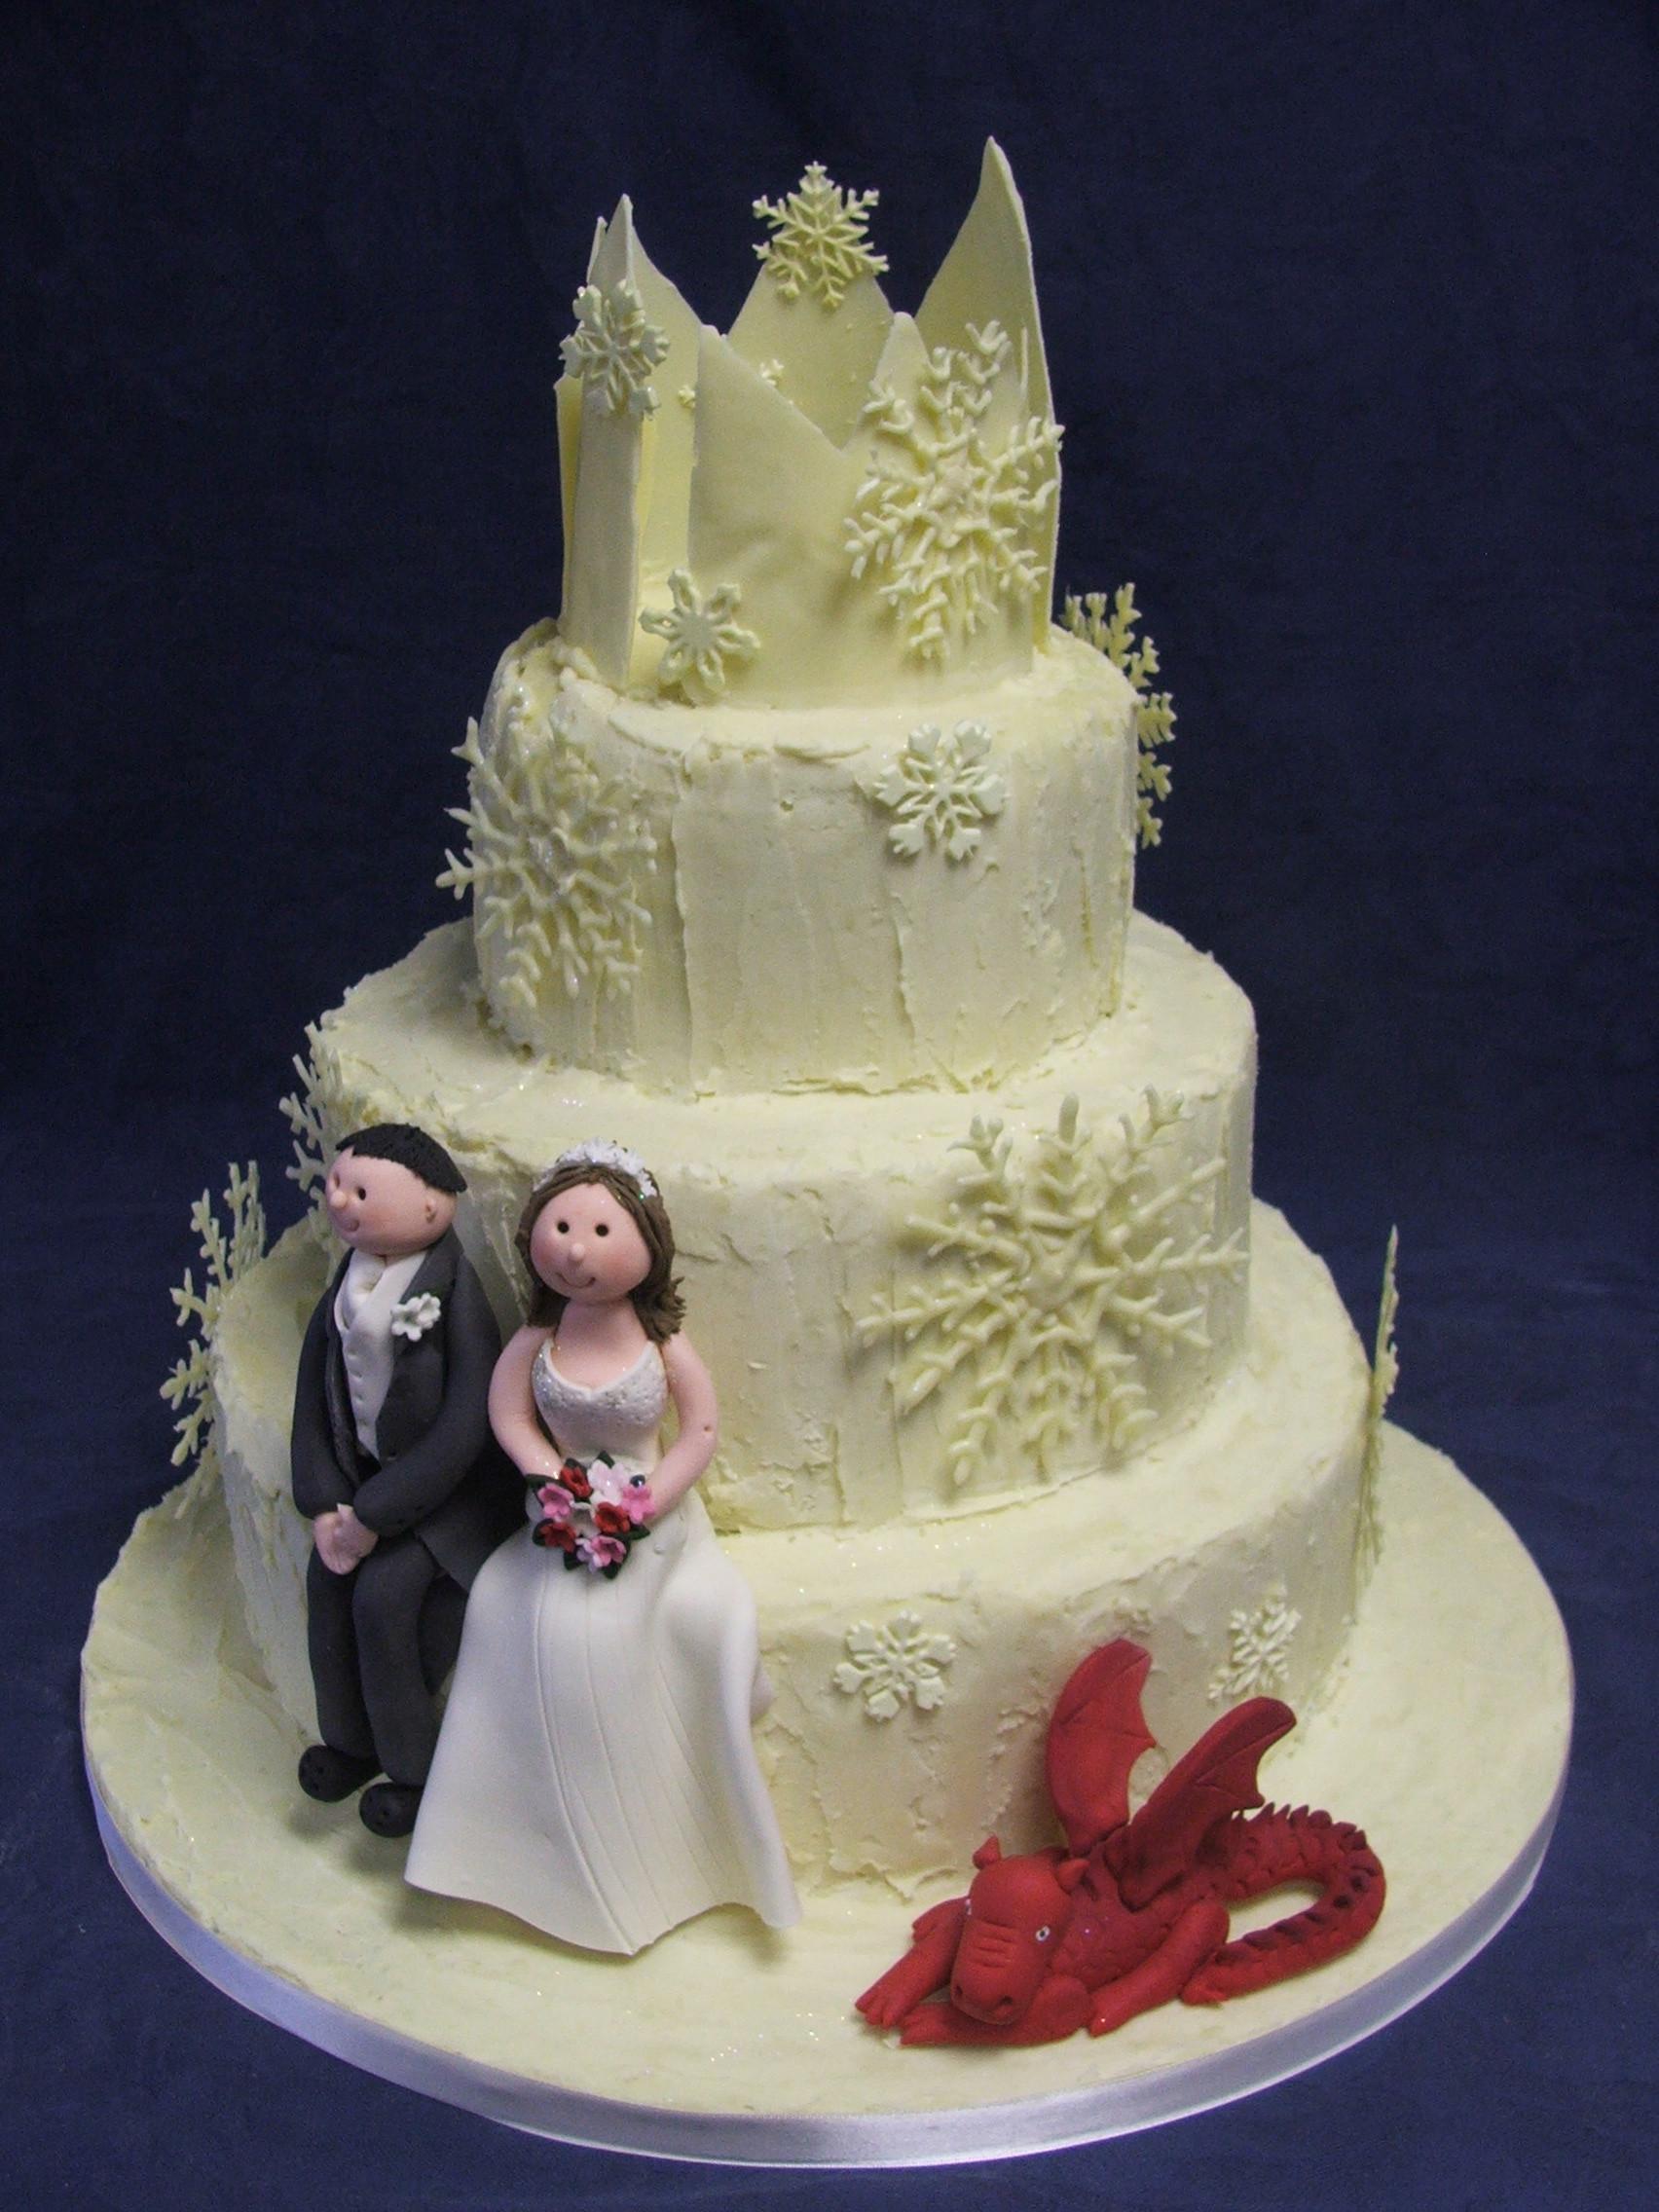 Dragon Wedding Cakes  Dragon Wedding Cake toppers